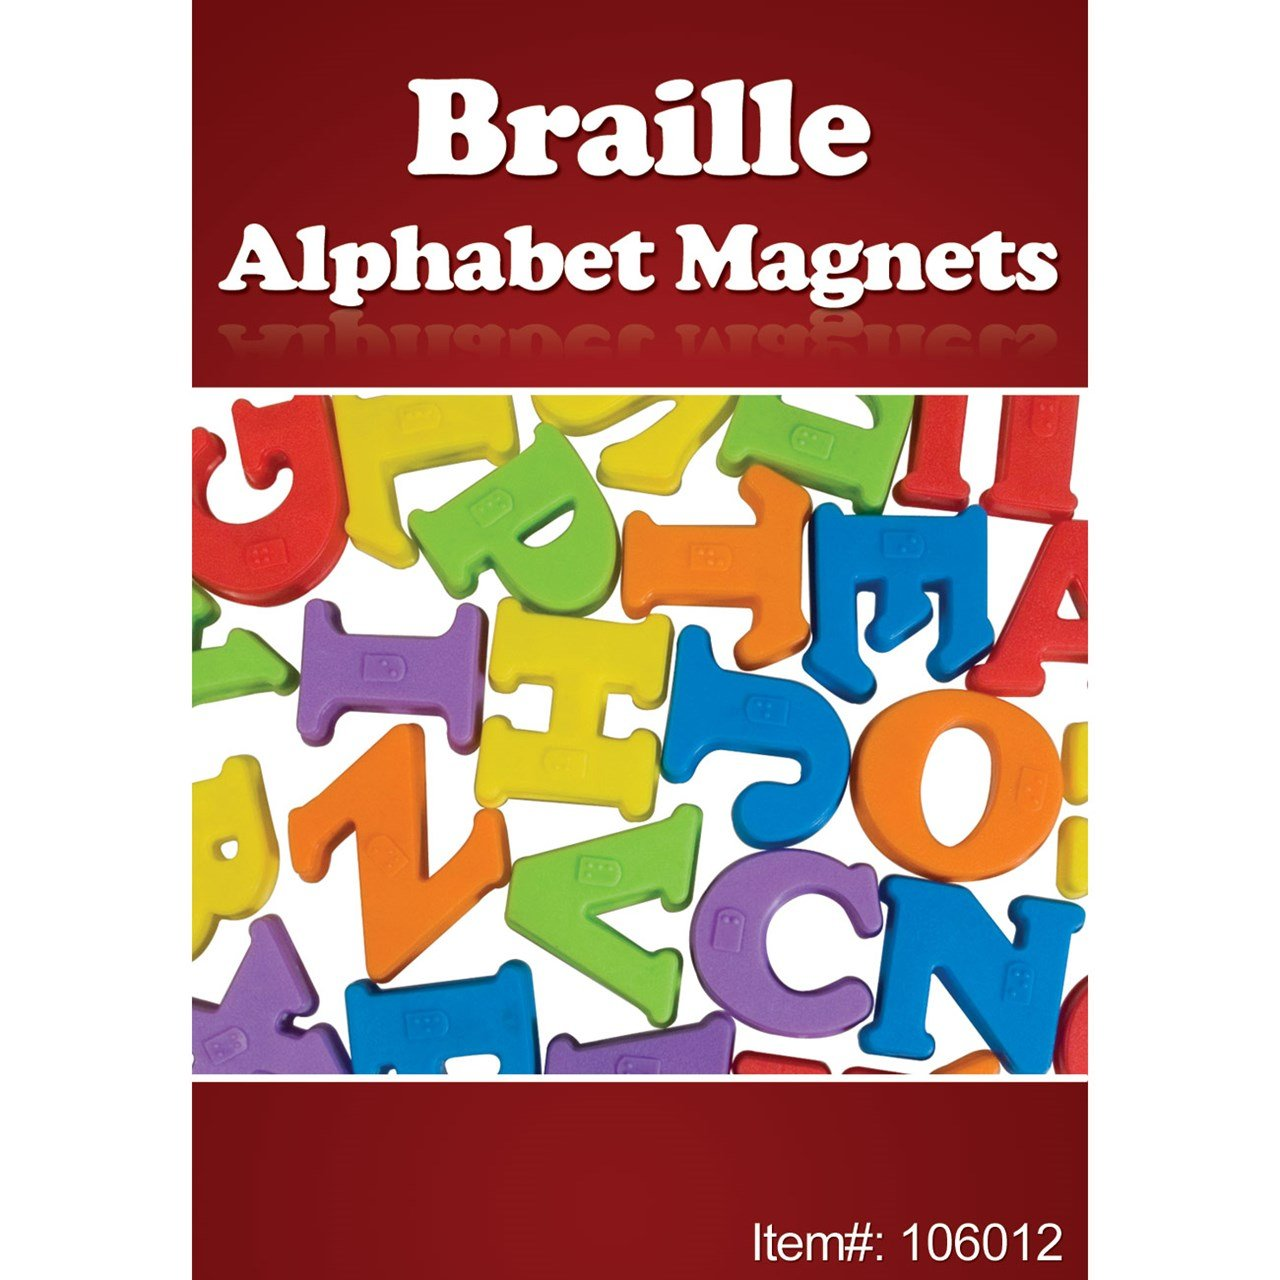 Design Alphabet Magnets amazon com braille alphabet magnets 26 upper case letters health personal care